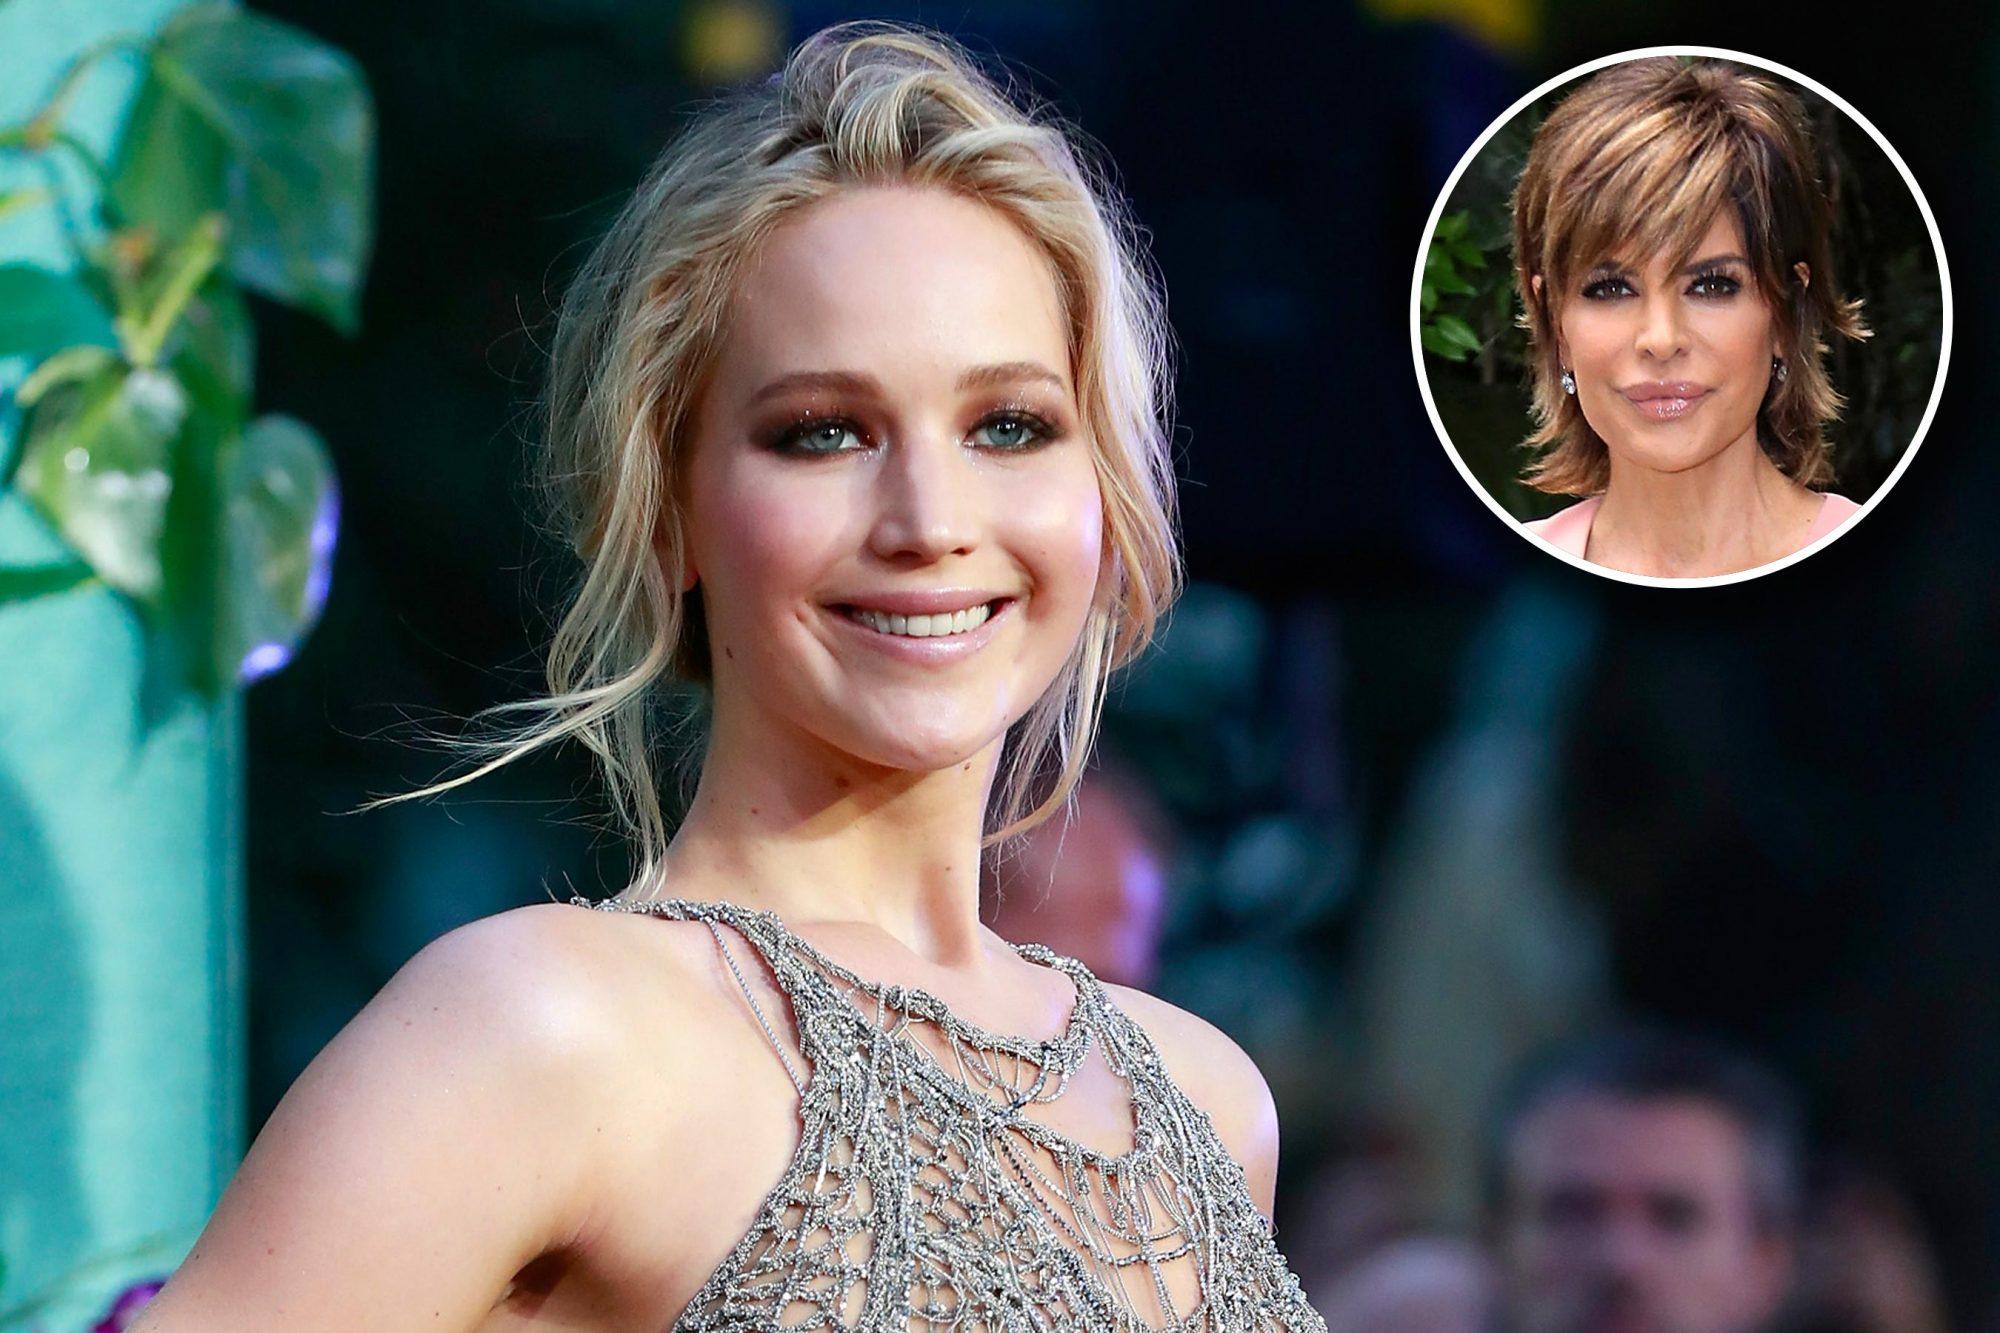 Jennifer-Lawrence-Lisa-Rinna